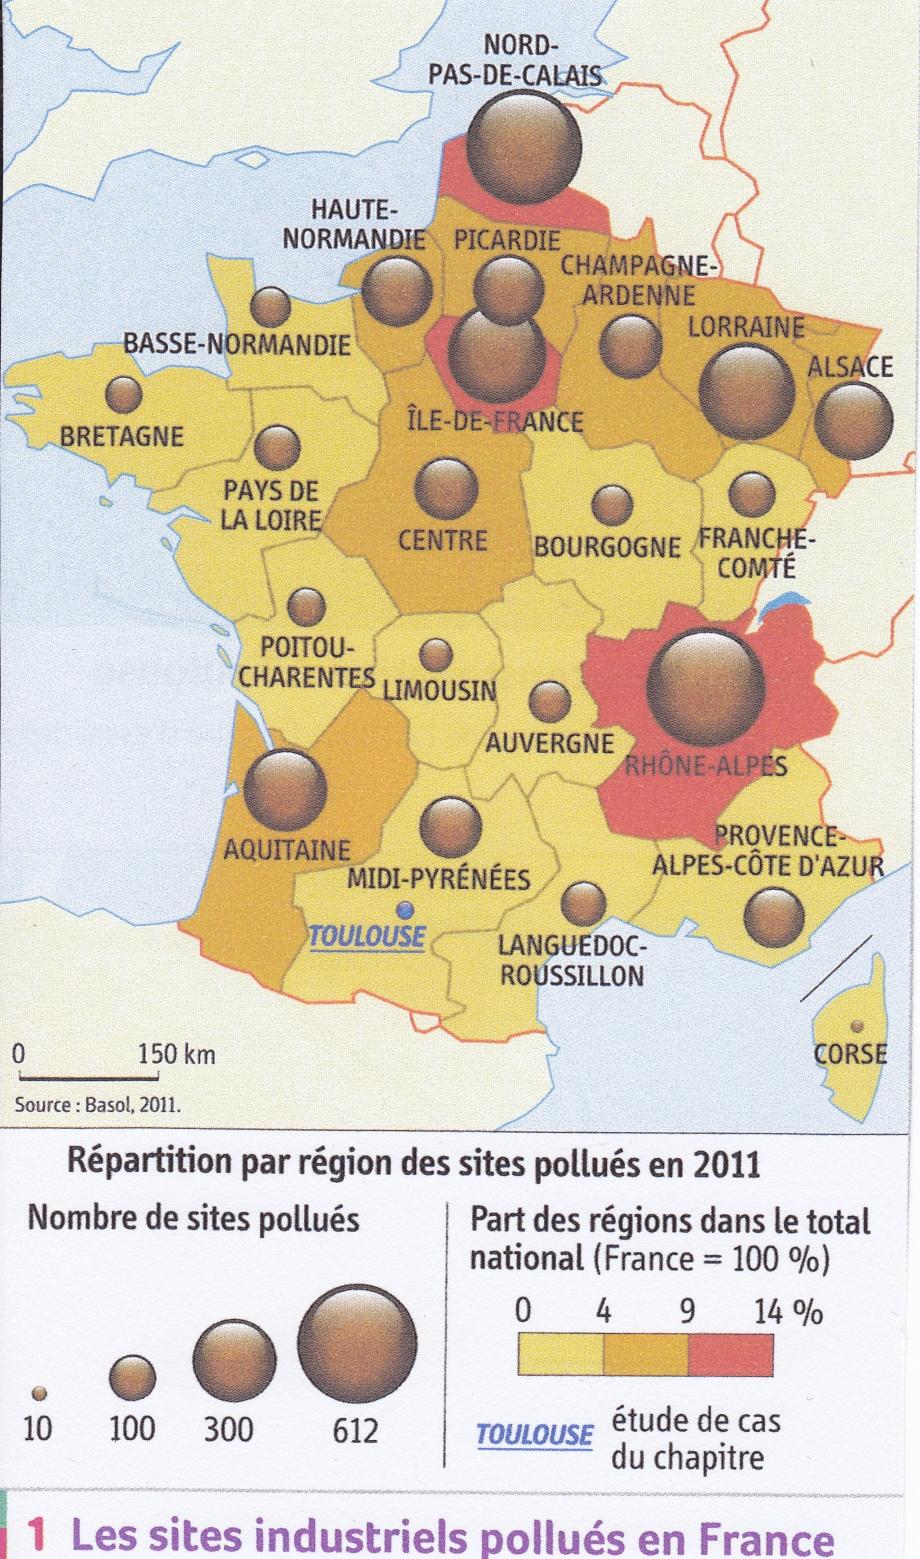 France. Pollution sites industriels (carte).jpg